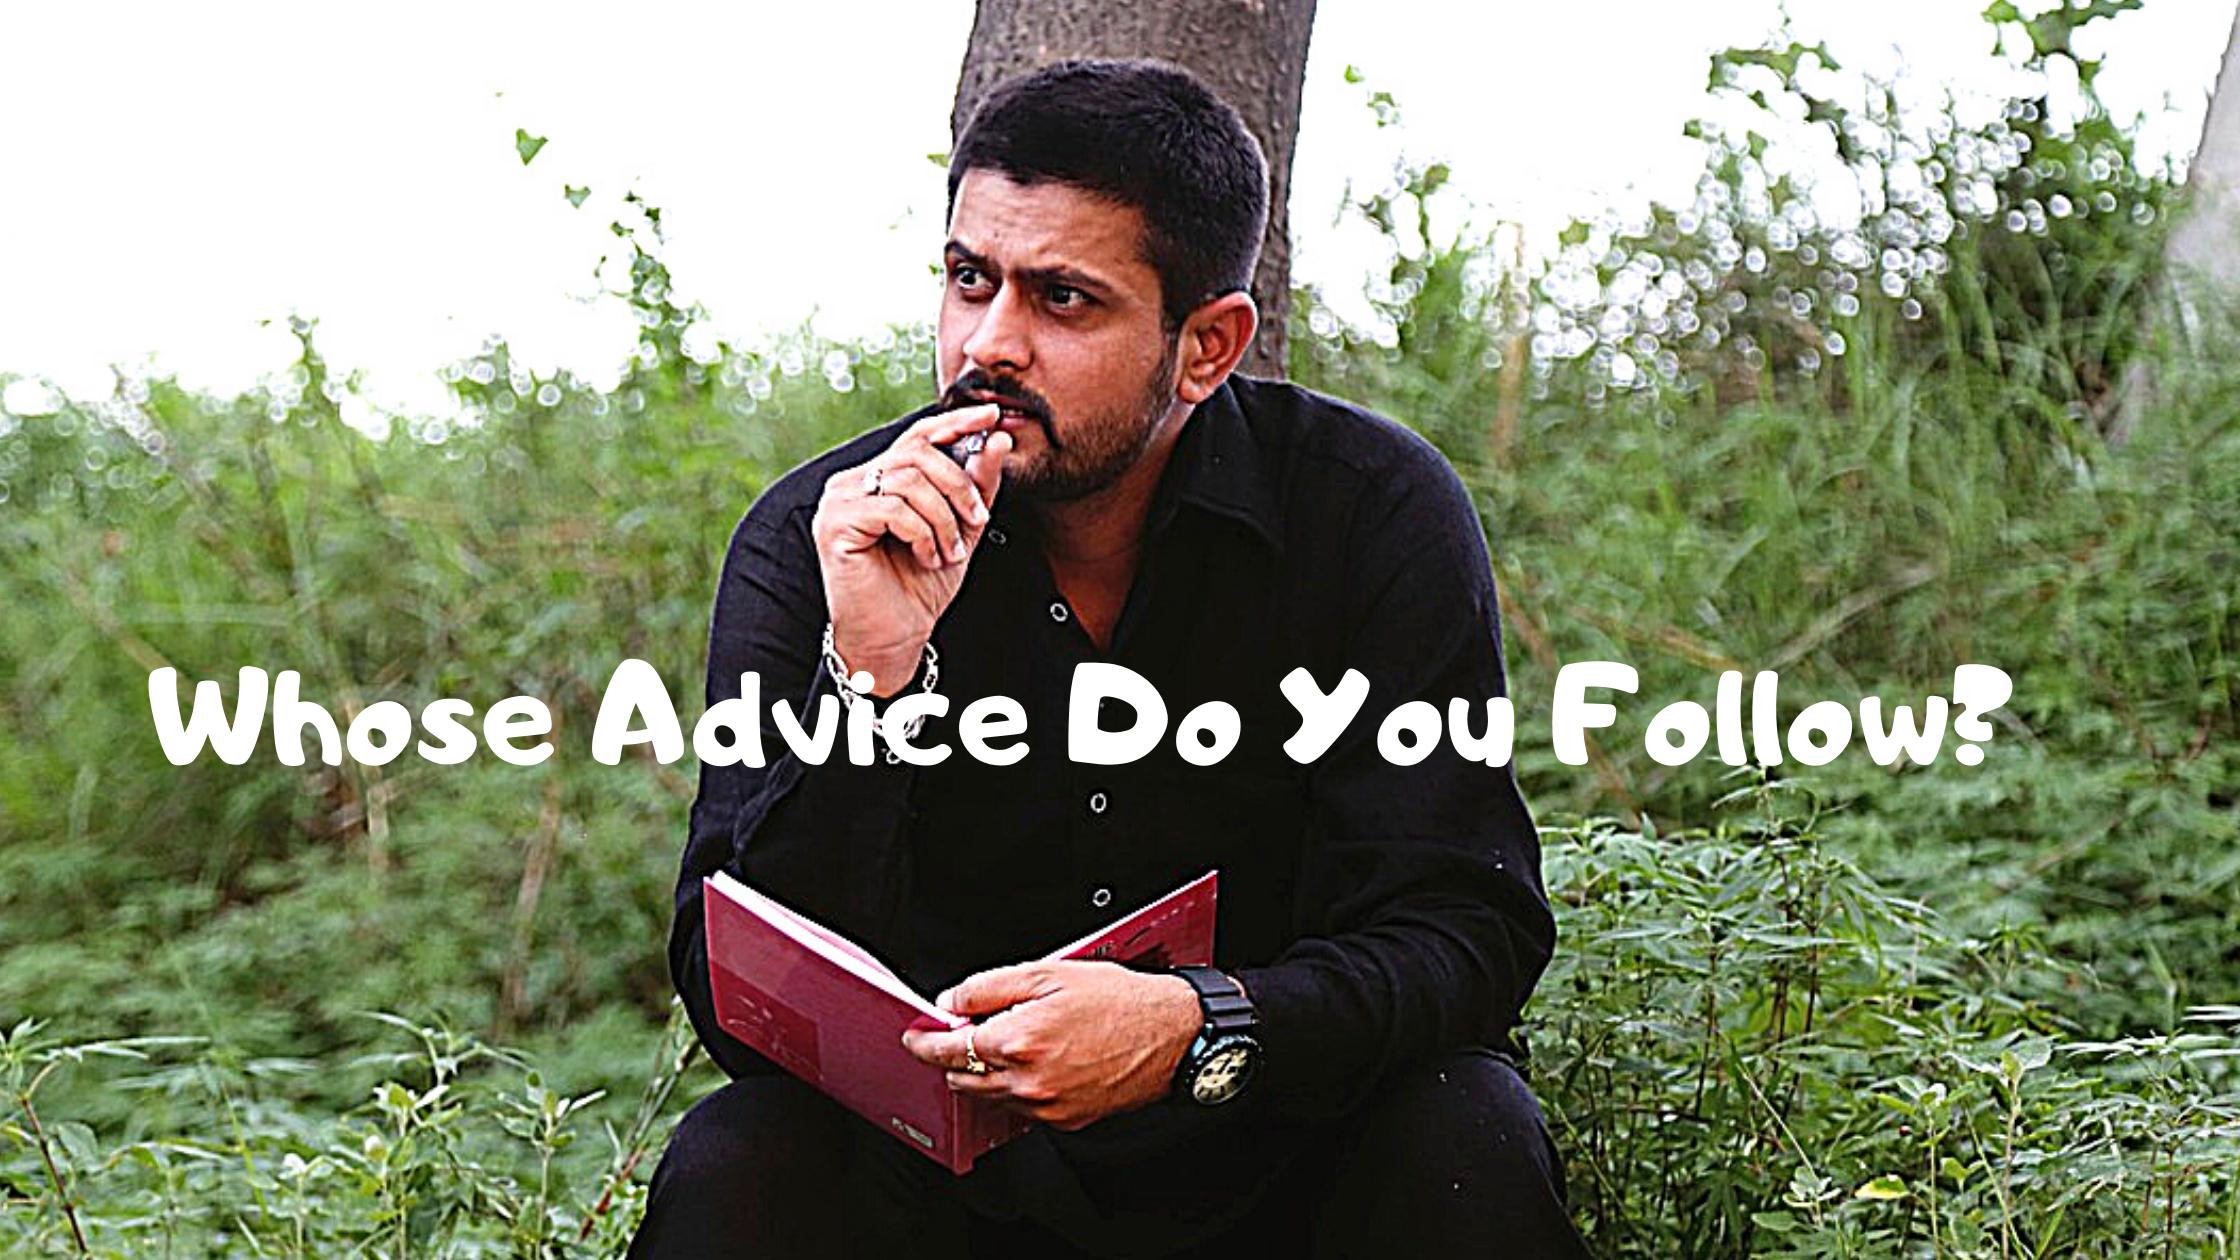 Whose advice do you follow?